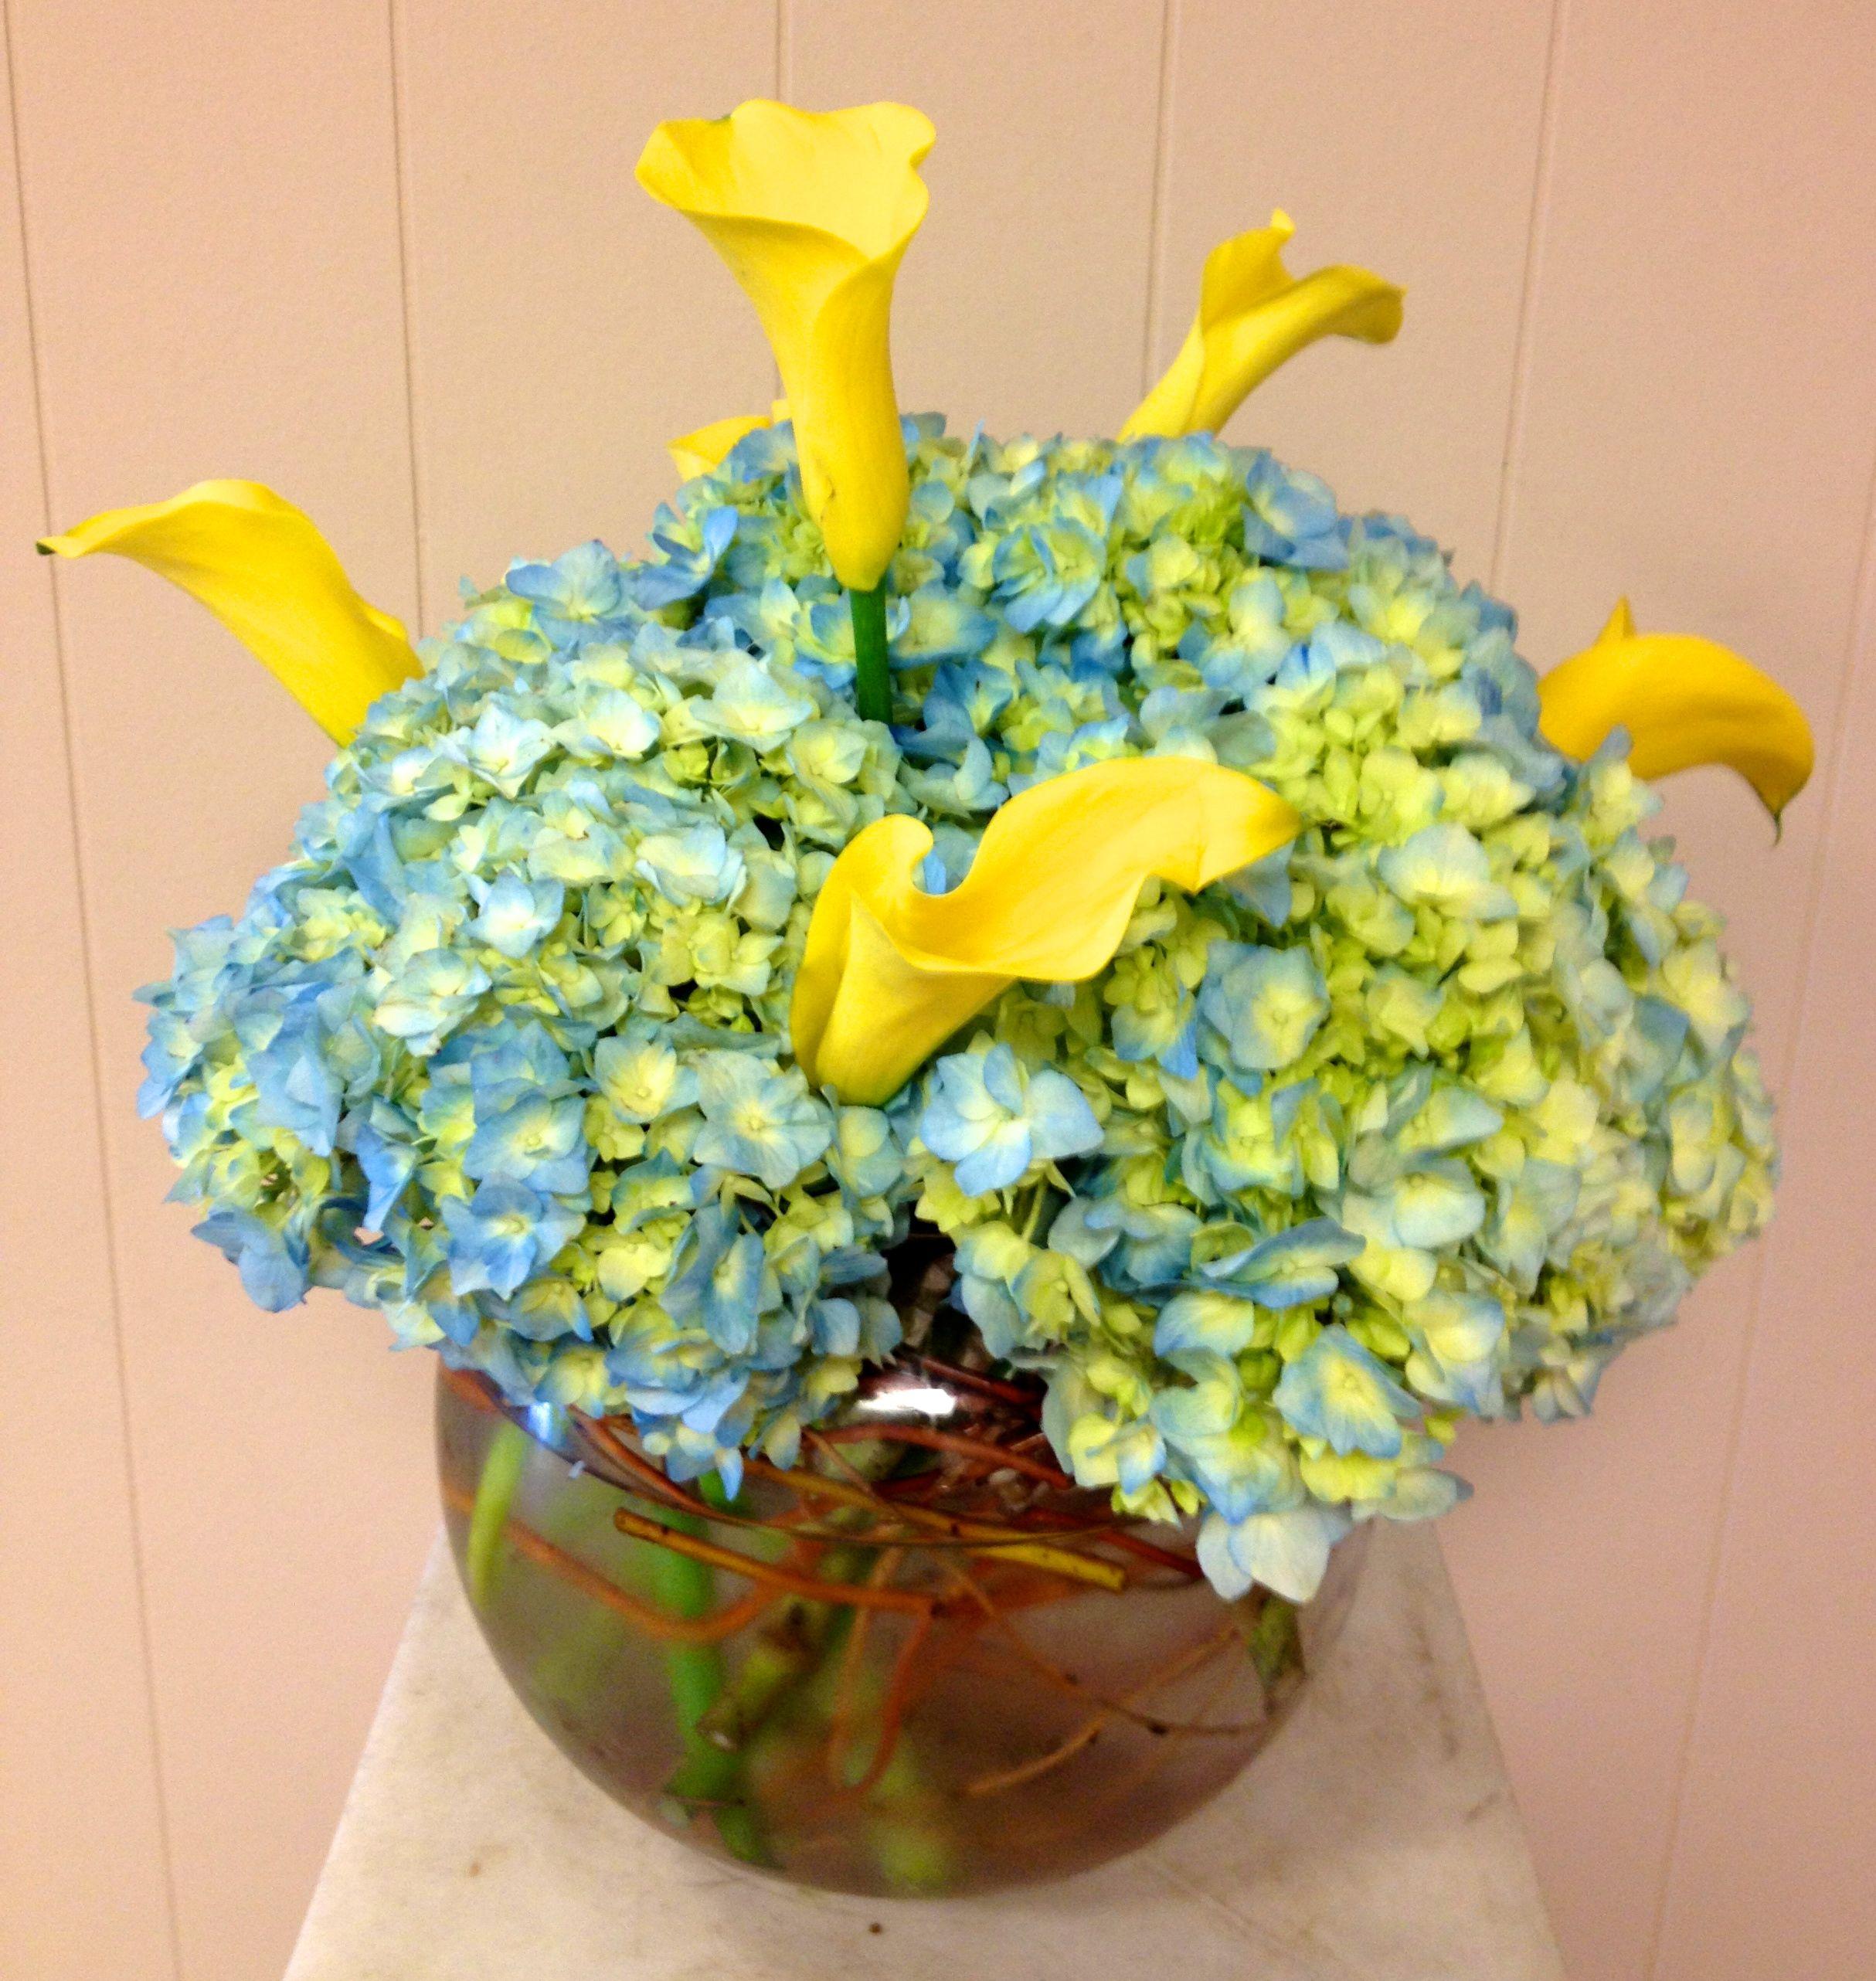 Fun Springy Wedding Centerpiece With Blue Hydrangea And Yellow Calla